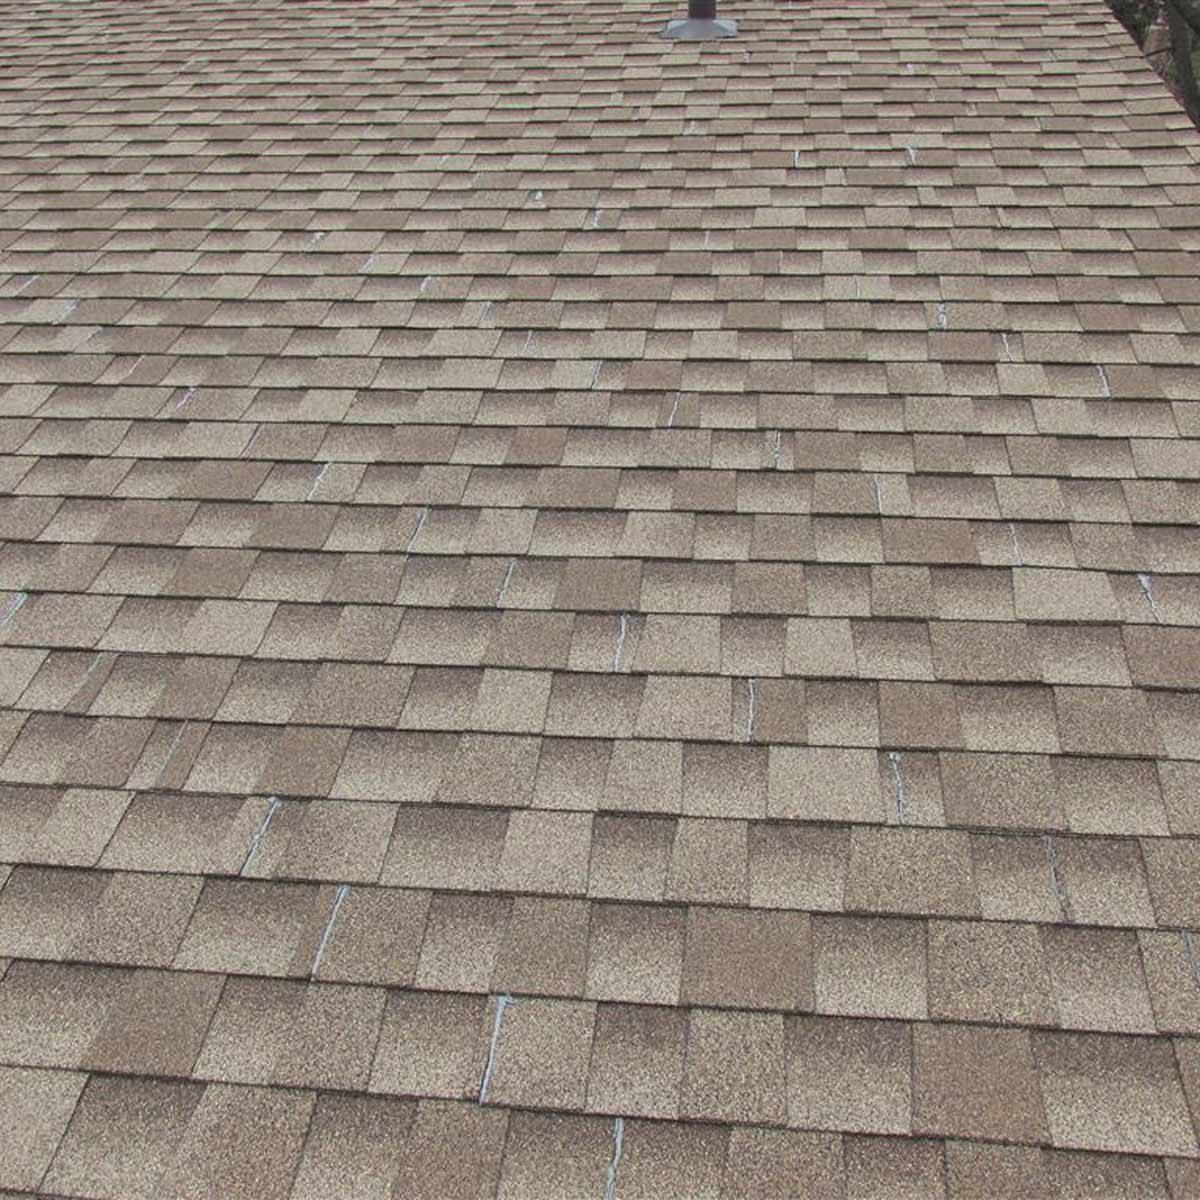 Belt and suspender roofing